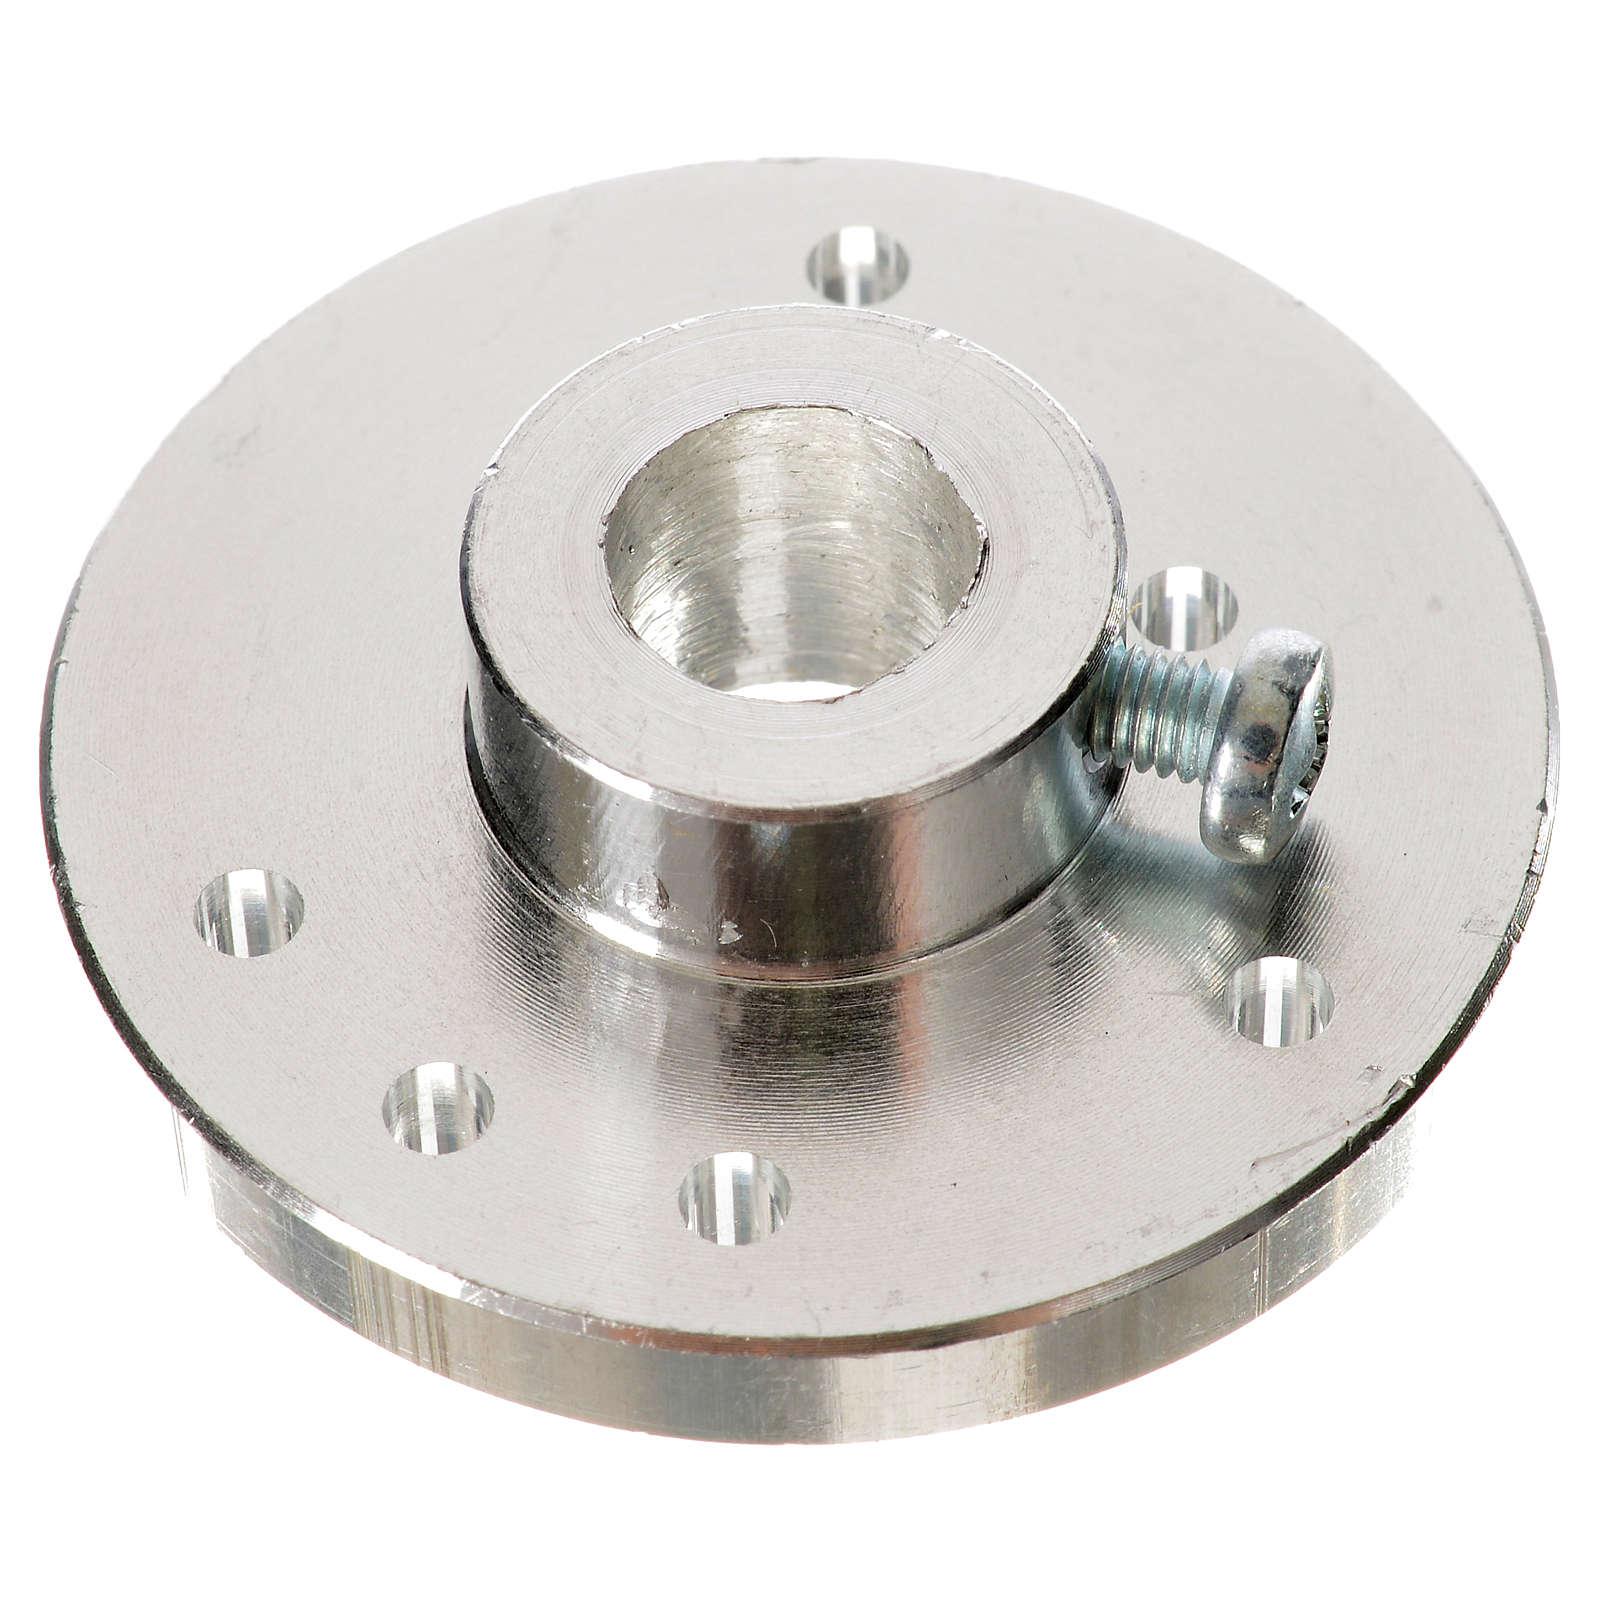 Roldana para motoredutor para eixo diâm 8 mm MP 4